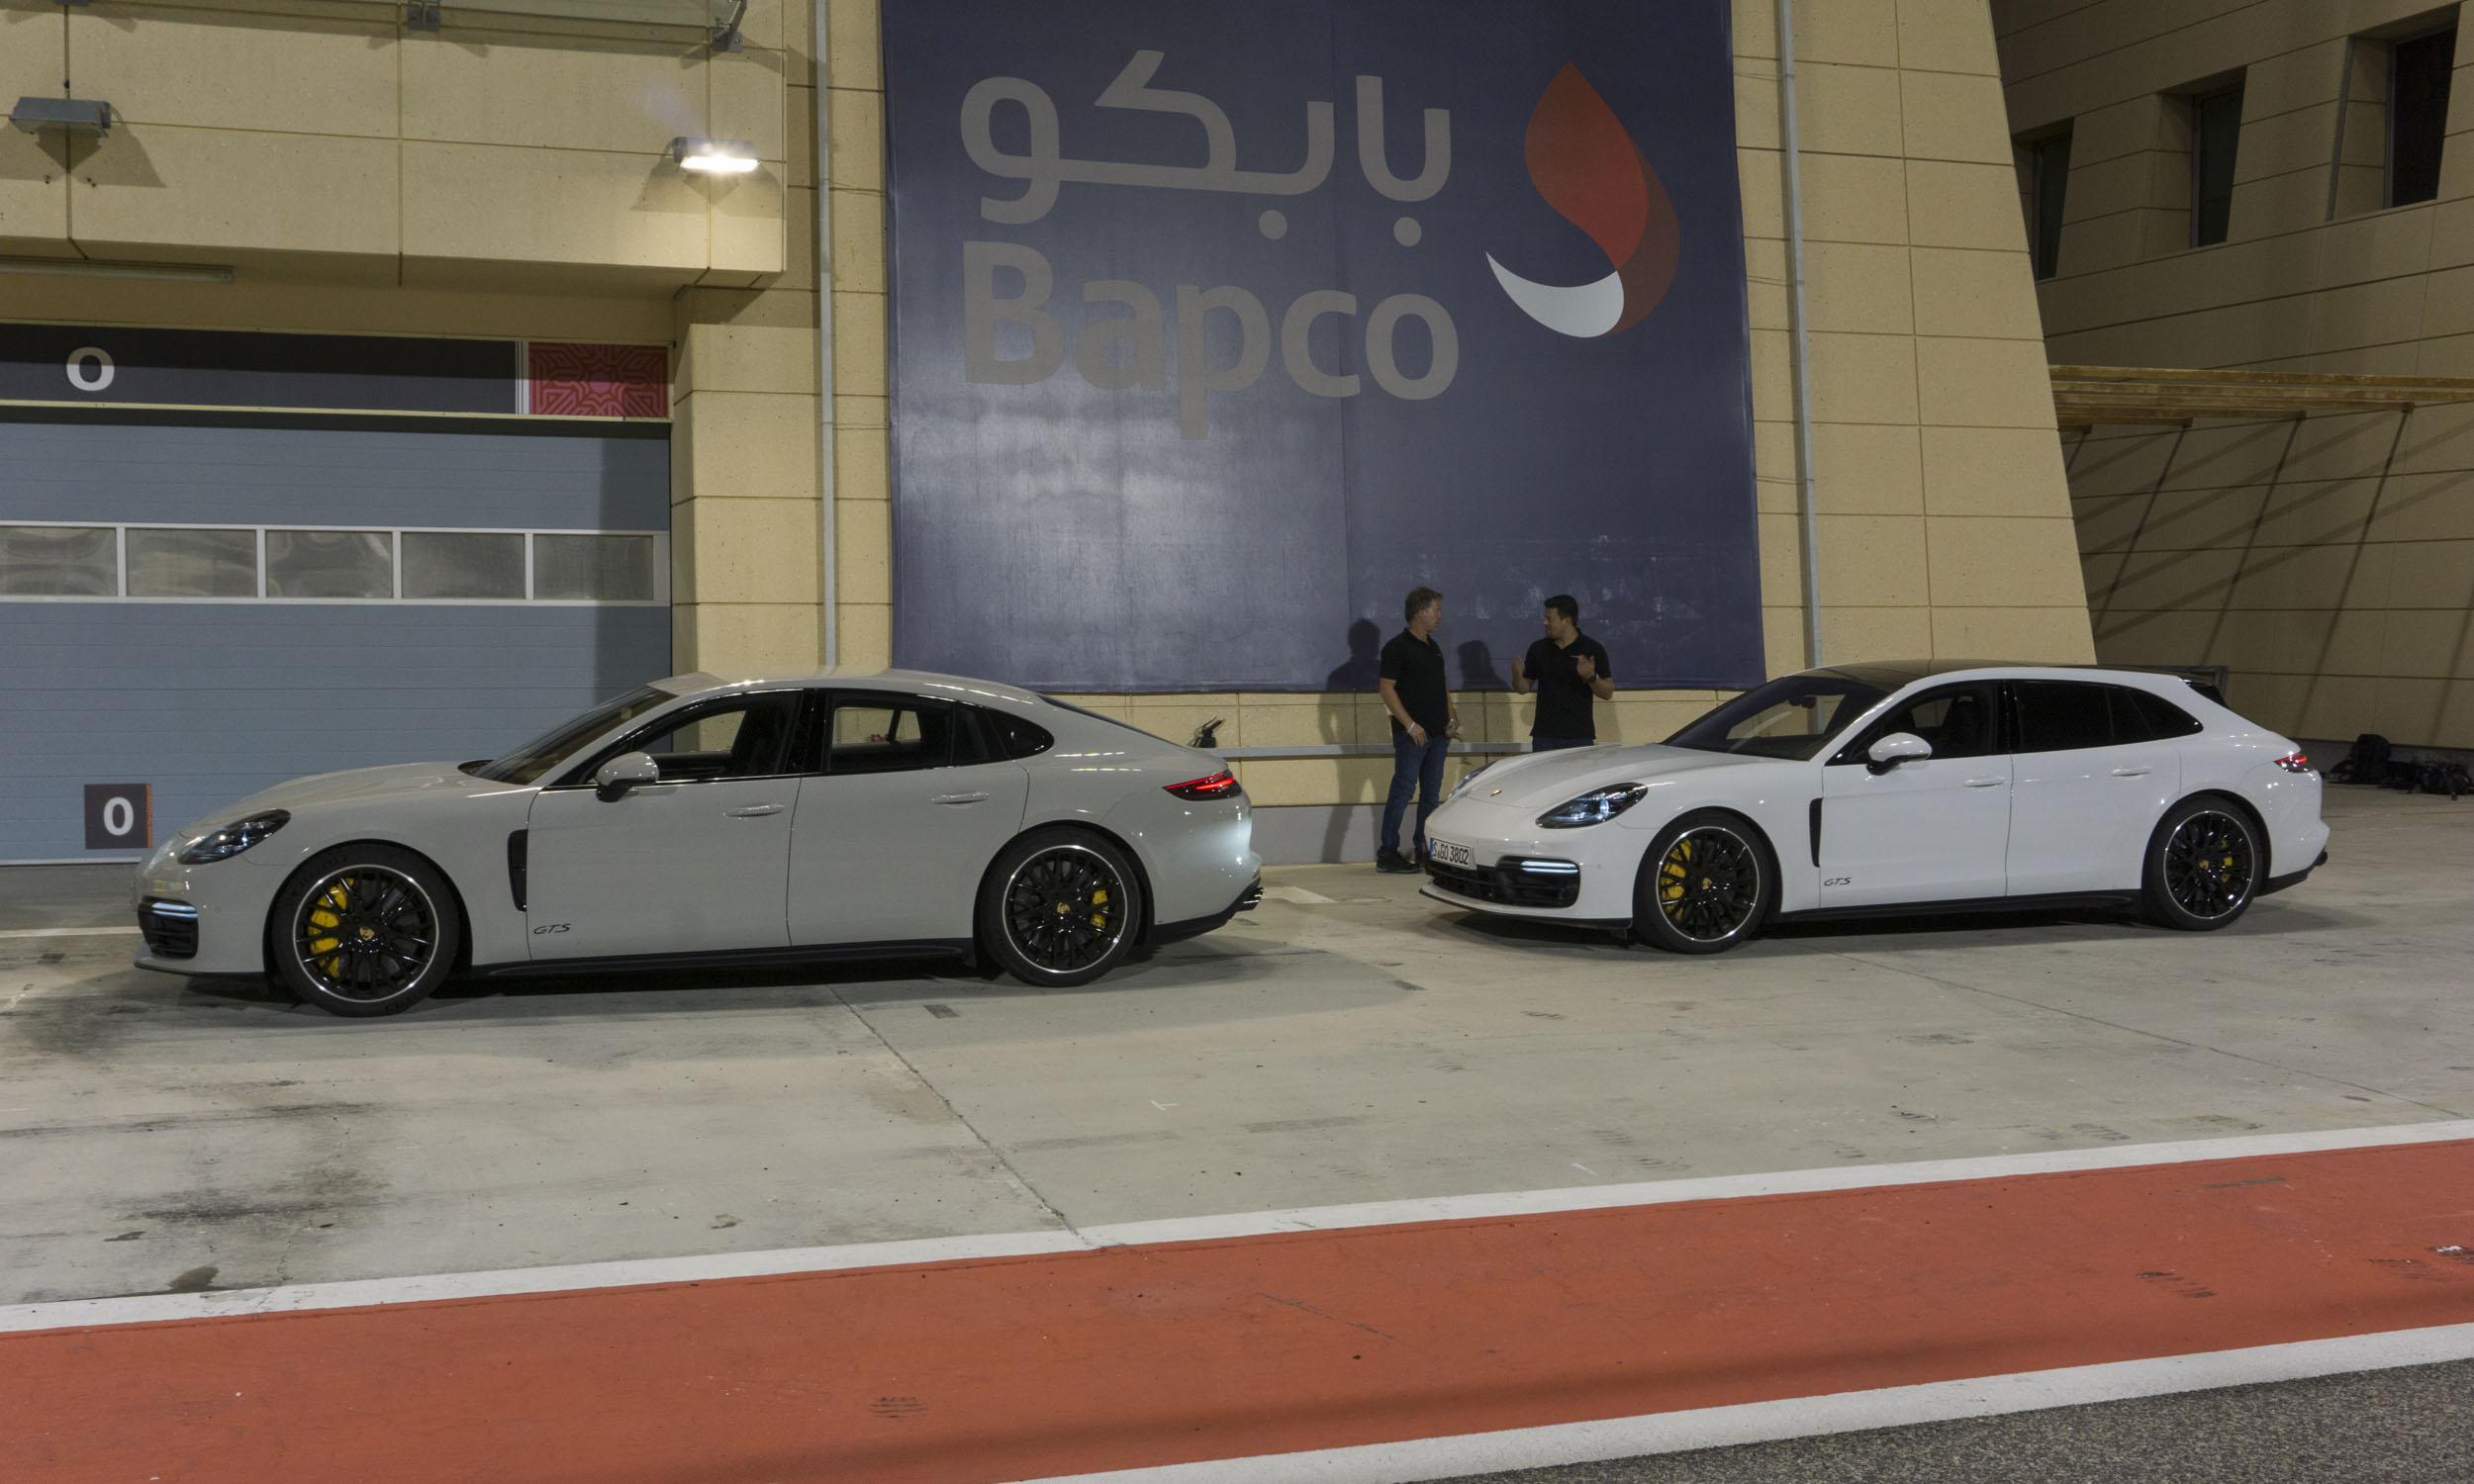 2019 Porsche Panamera Gts First Drive Review Autonxt